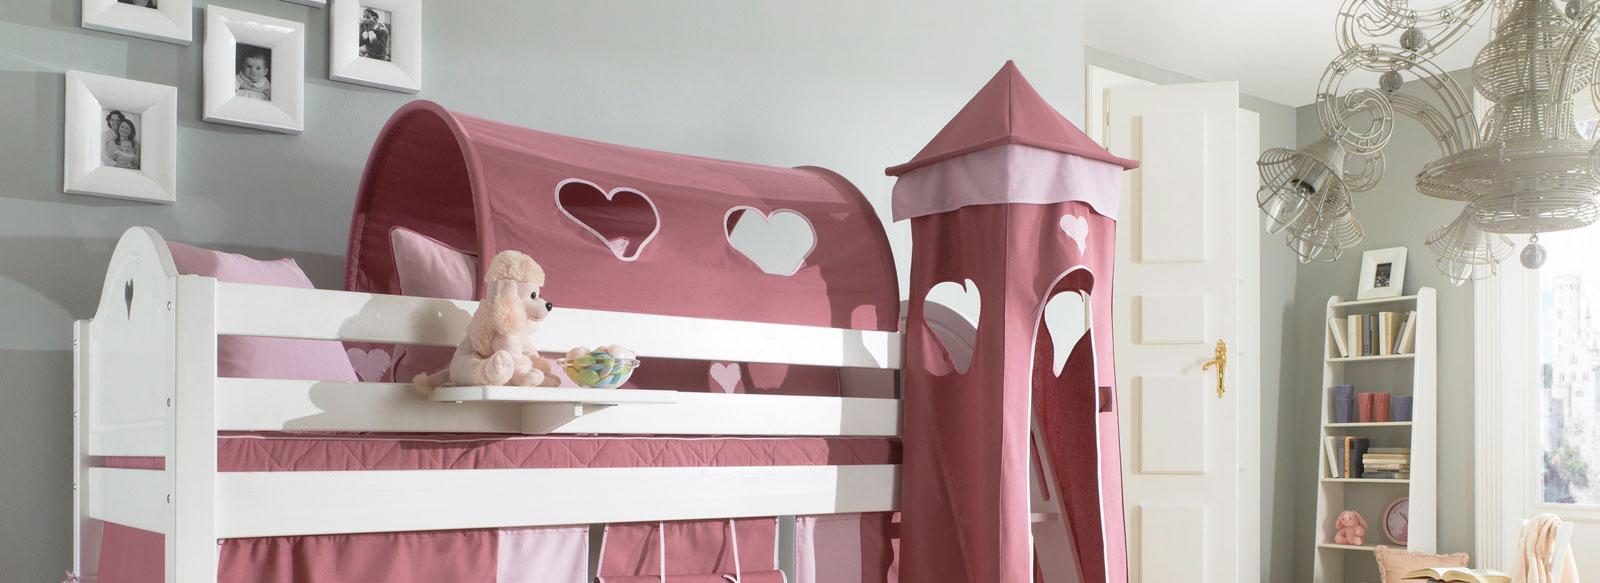 Kinderzimmer Möbel skandinavisch